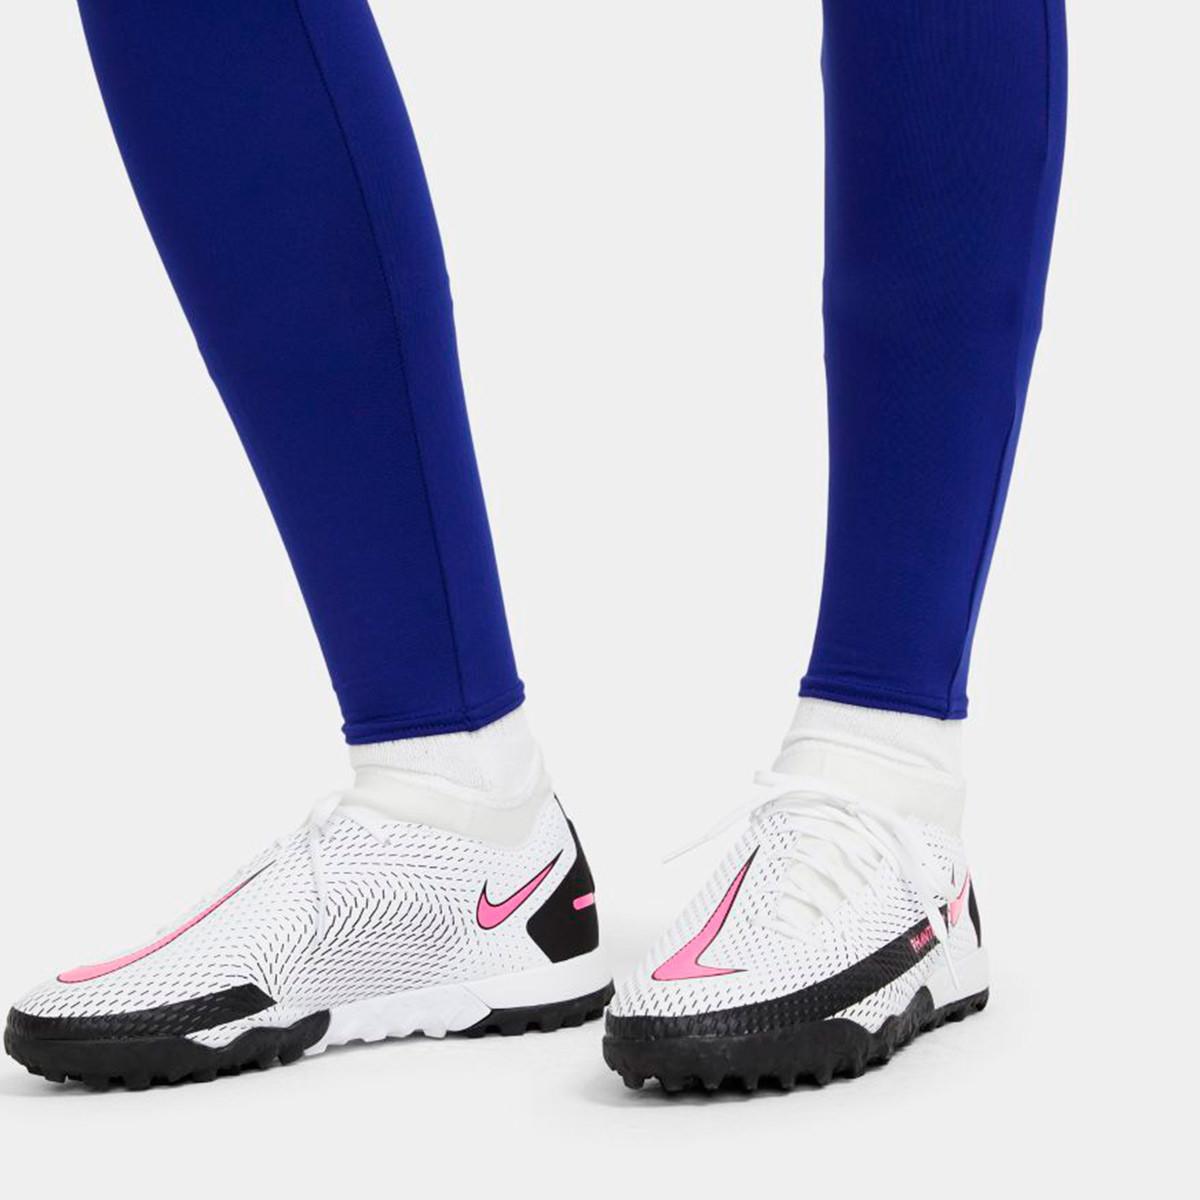 Pantalon Largo Nike Fc Barcelona Academy Pro Knit 2020 2021 Mujer Deep Royal Blue Light Fusion Red Futbol Emotion